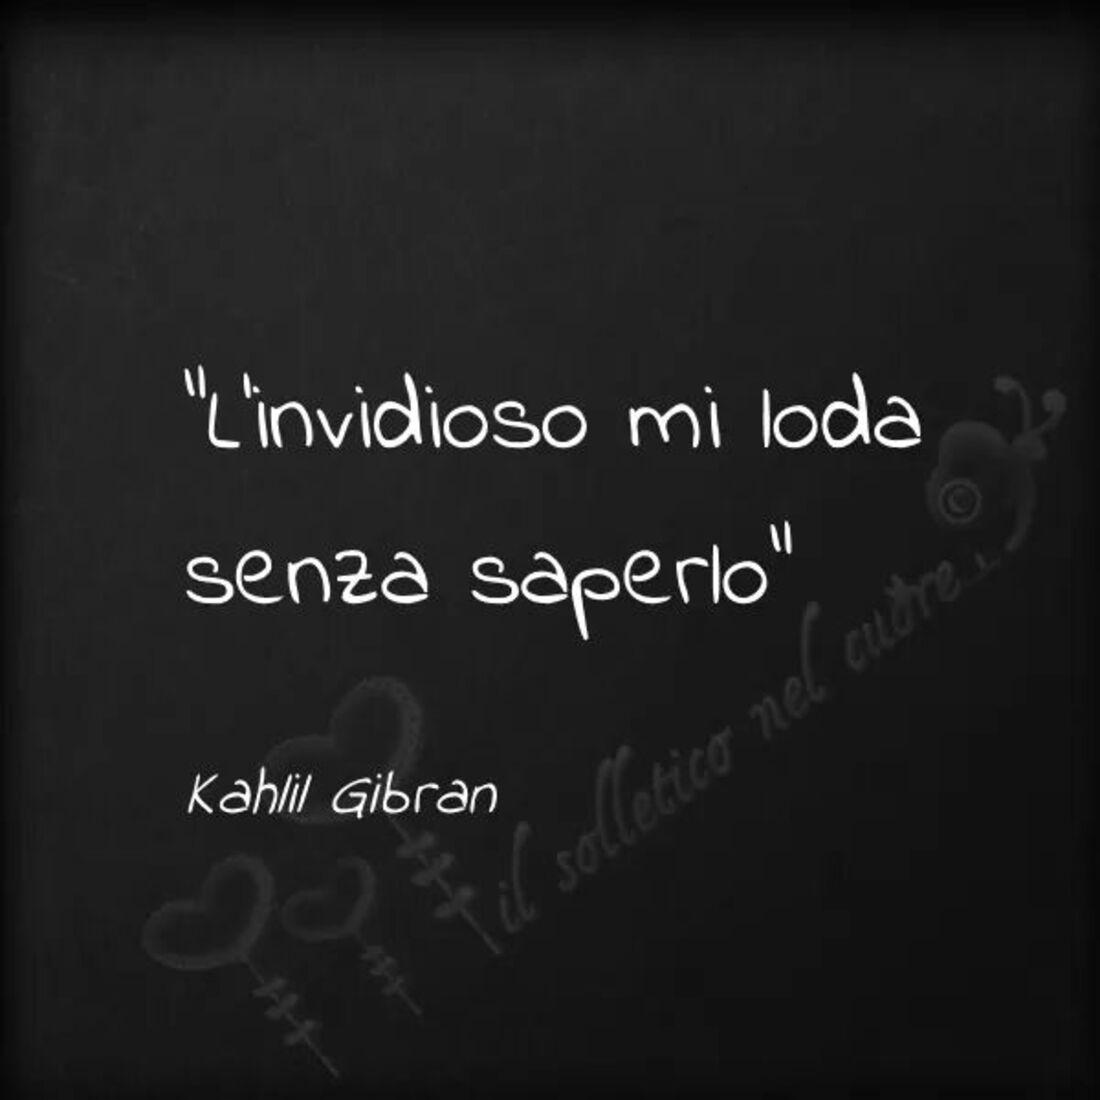 """L'invidioso mi loda senza saperlo."" - Kahlil Gibran"